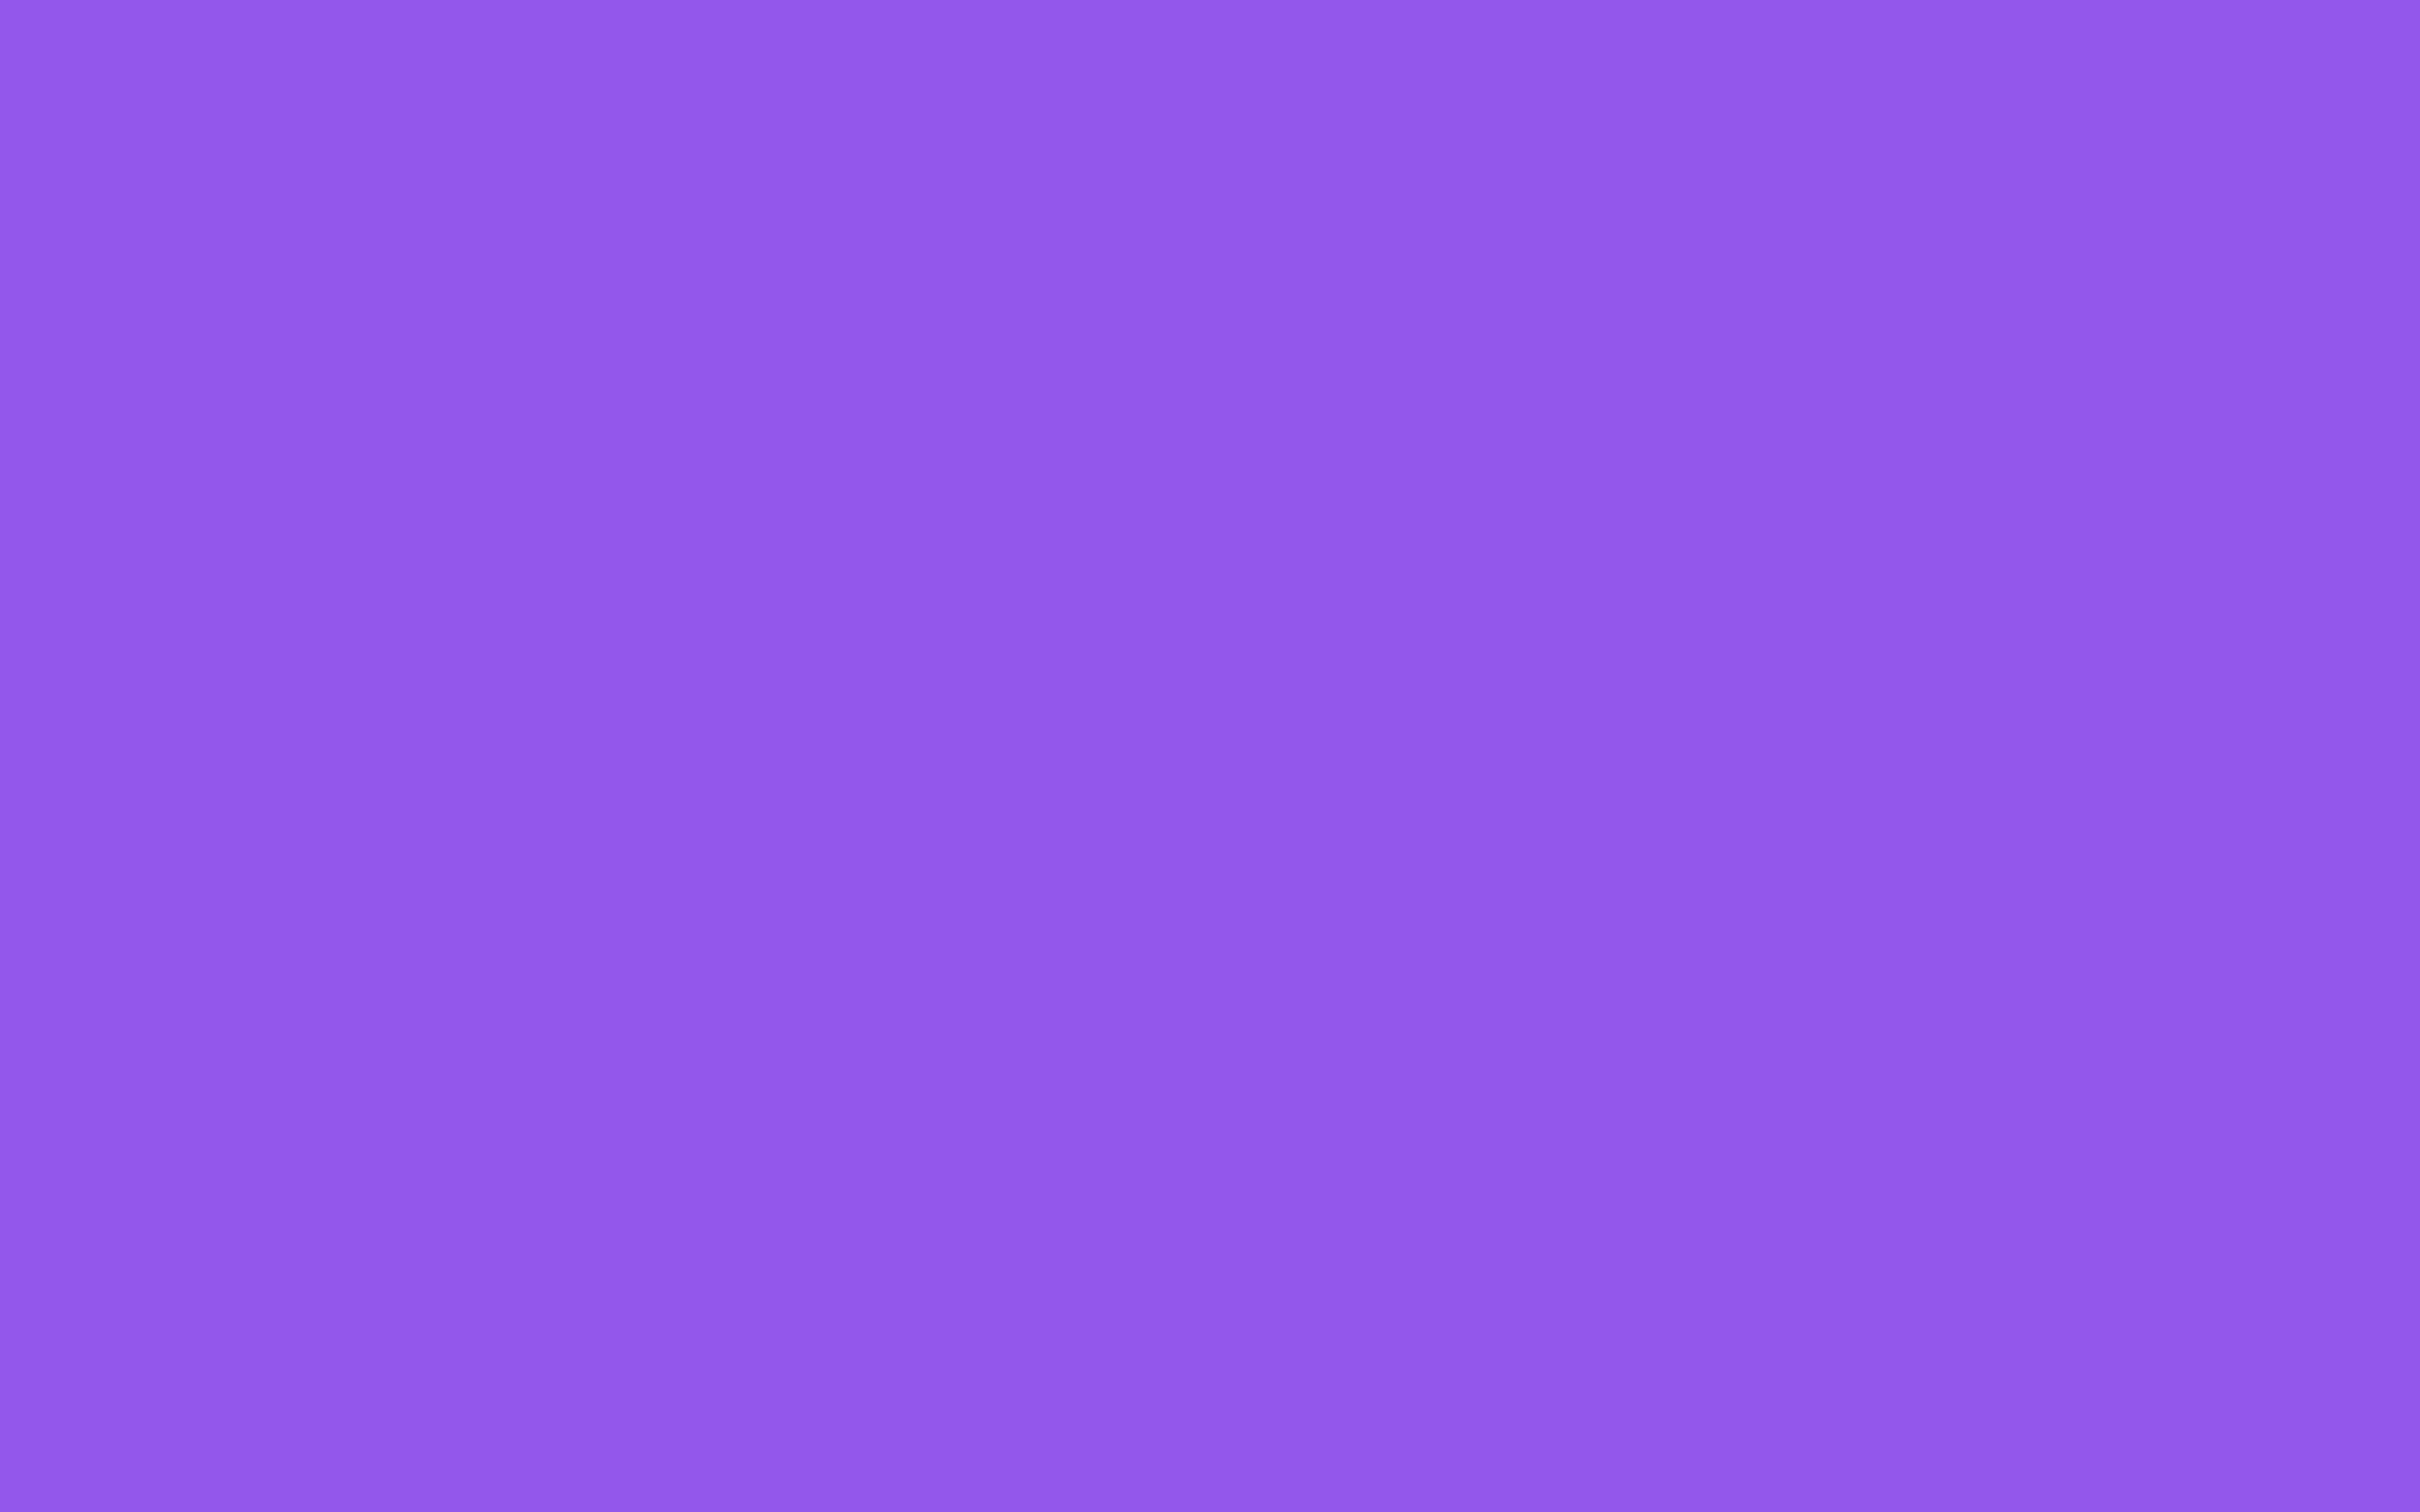 Lavender Indigo Solid Color Background